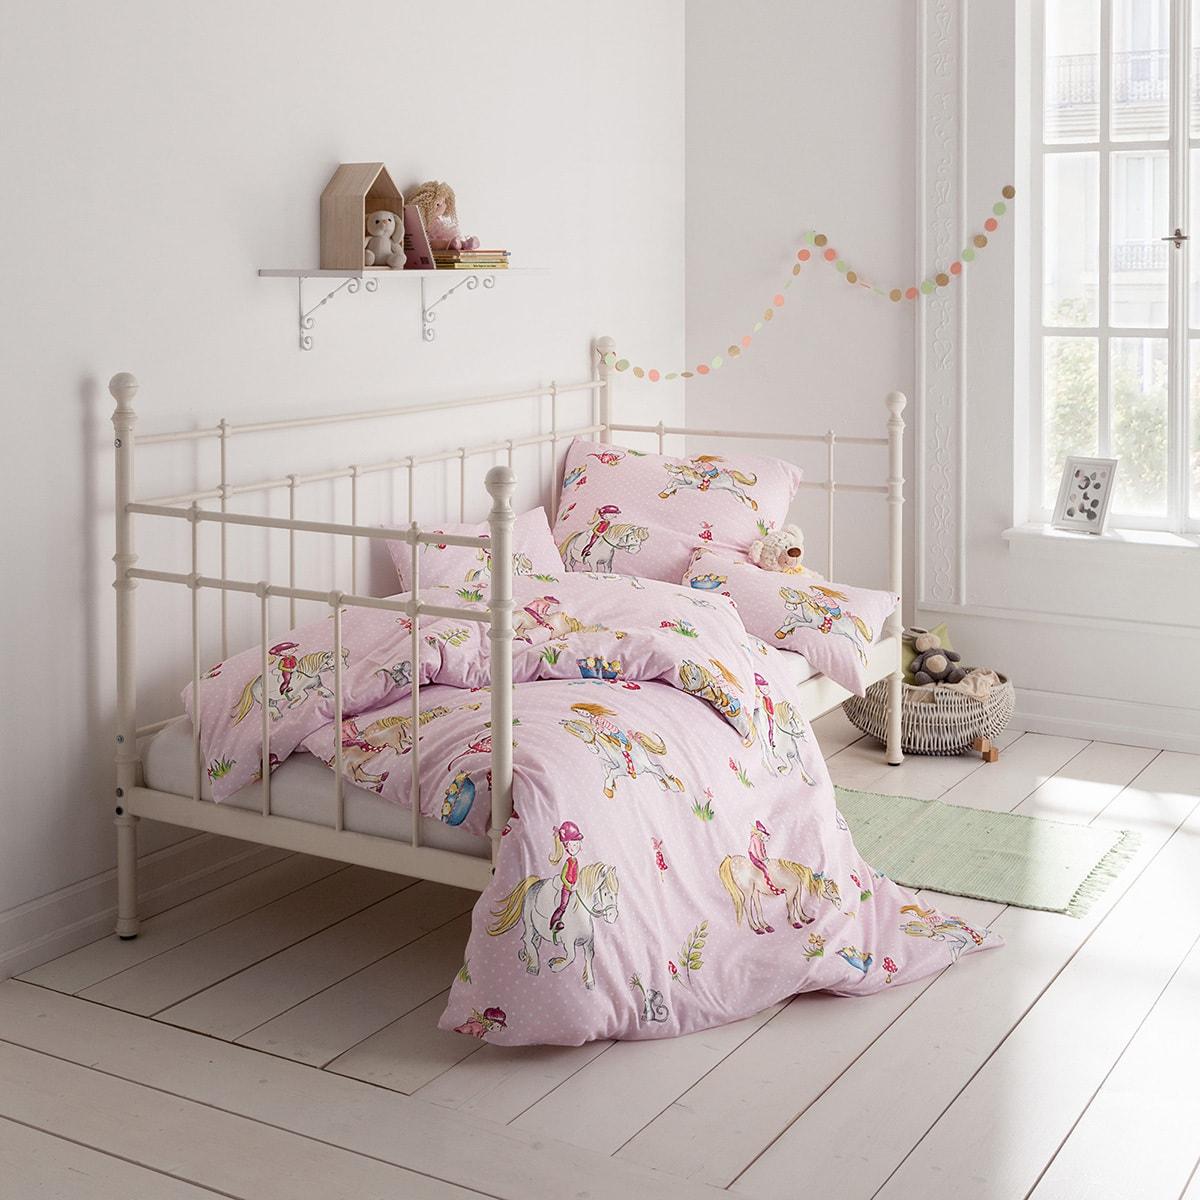 estella mako interlock jersey kinderbettw sche lena rosa g nstig online kaufen bei bettwaren shop. Black Bedroom Furniture Sets. Home Design Ideas